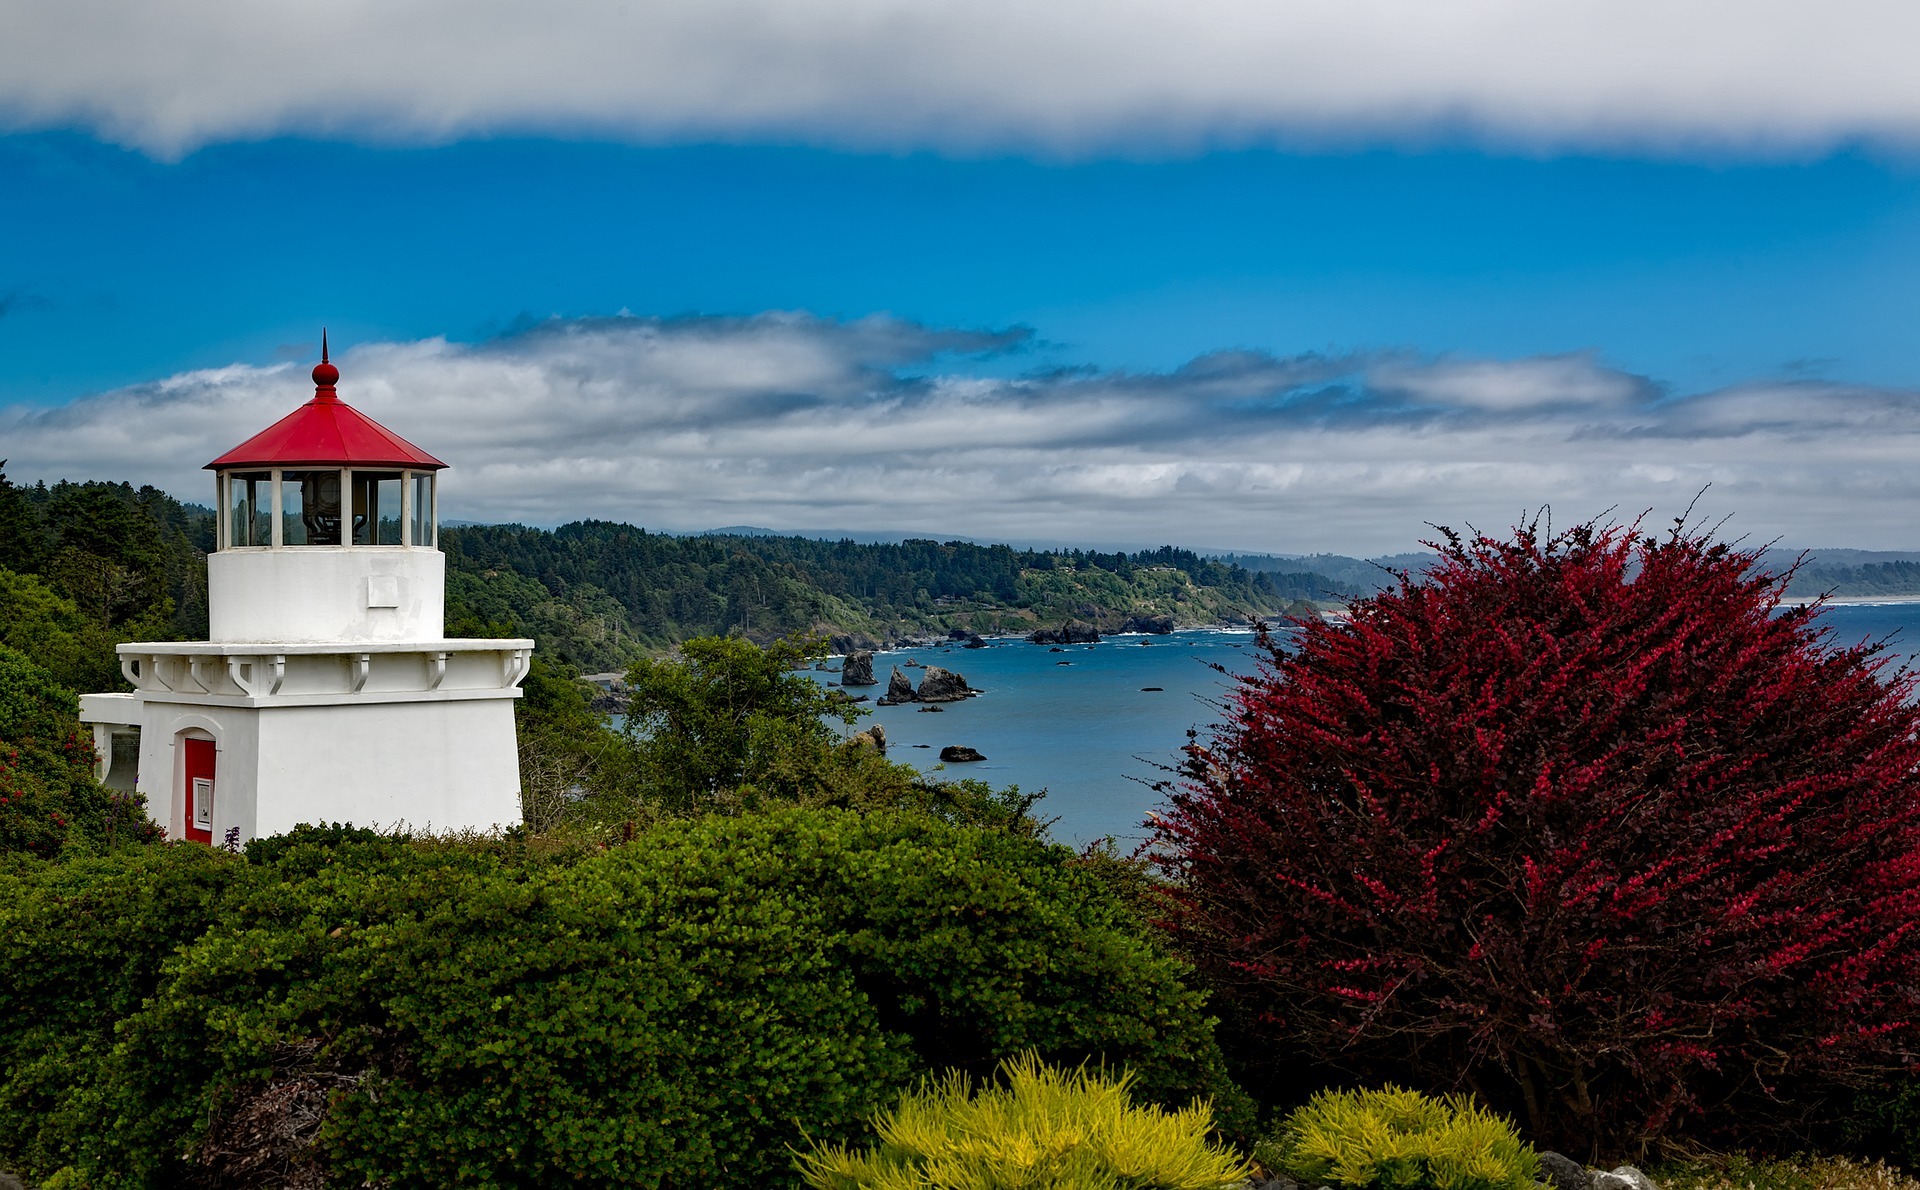 trinidad-memorial-lighthouse-1599182_1920.jpg